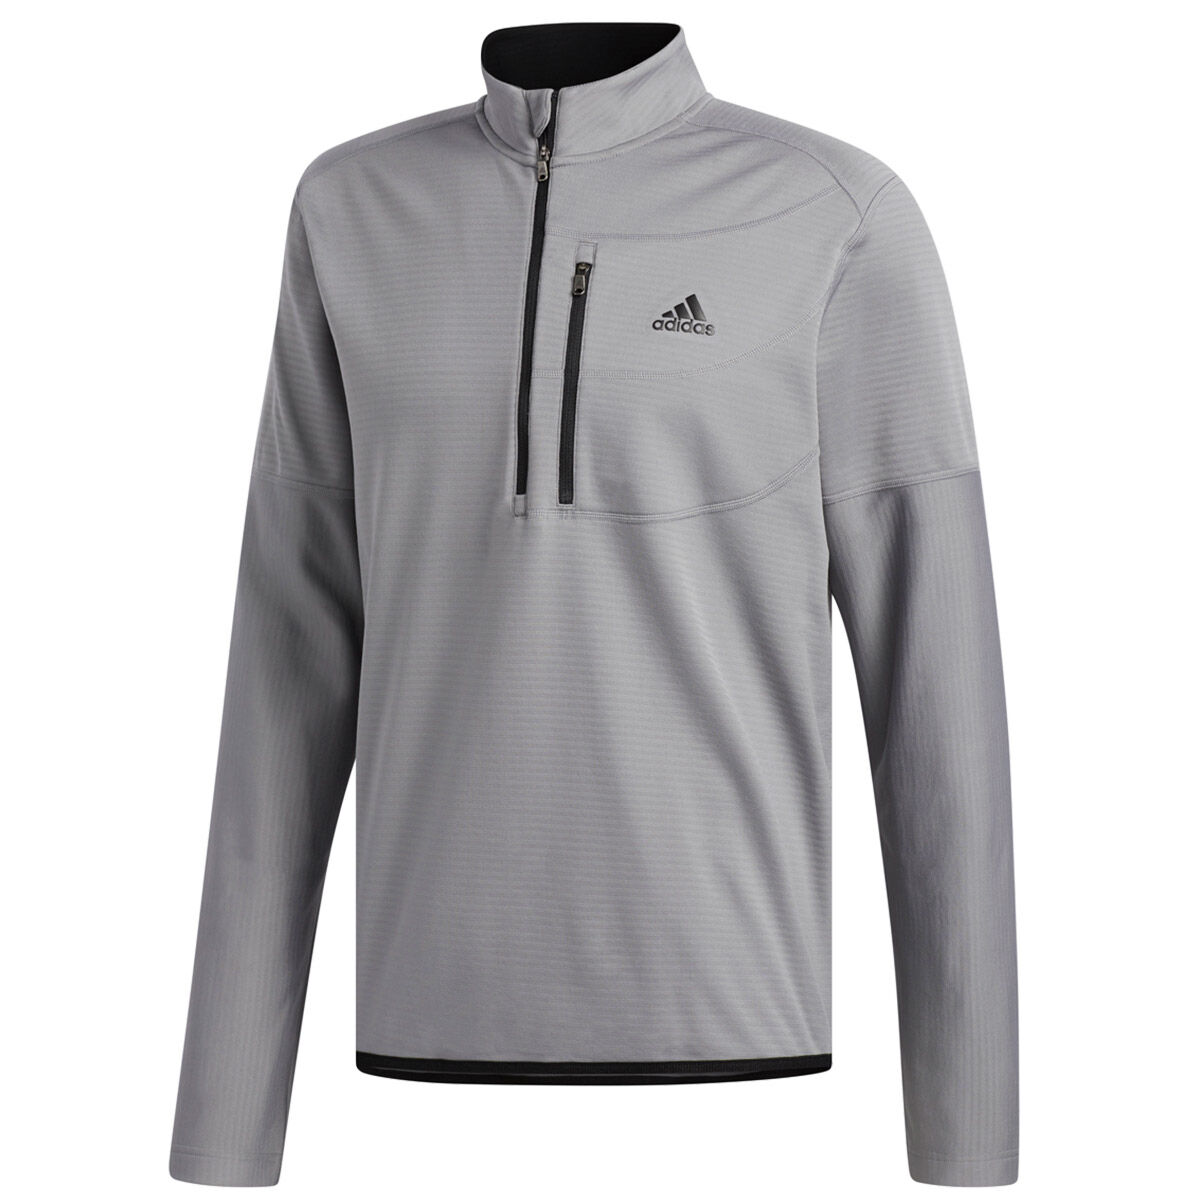 adidas Golf Climawarm Gridded Jacket | Online Golf